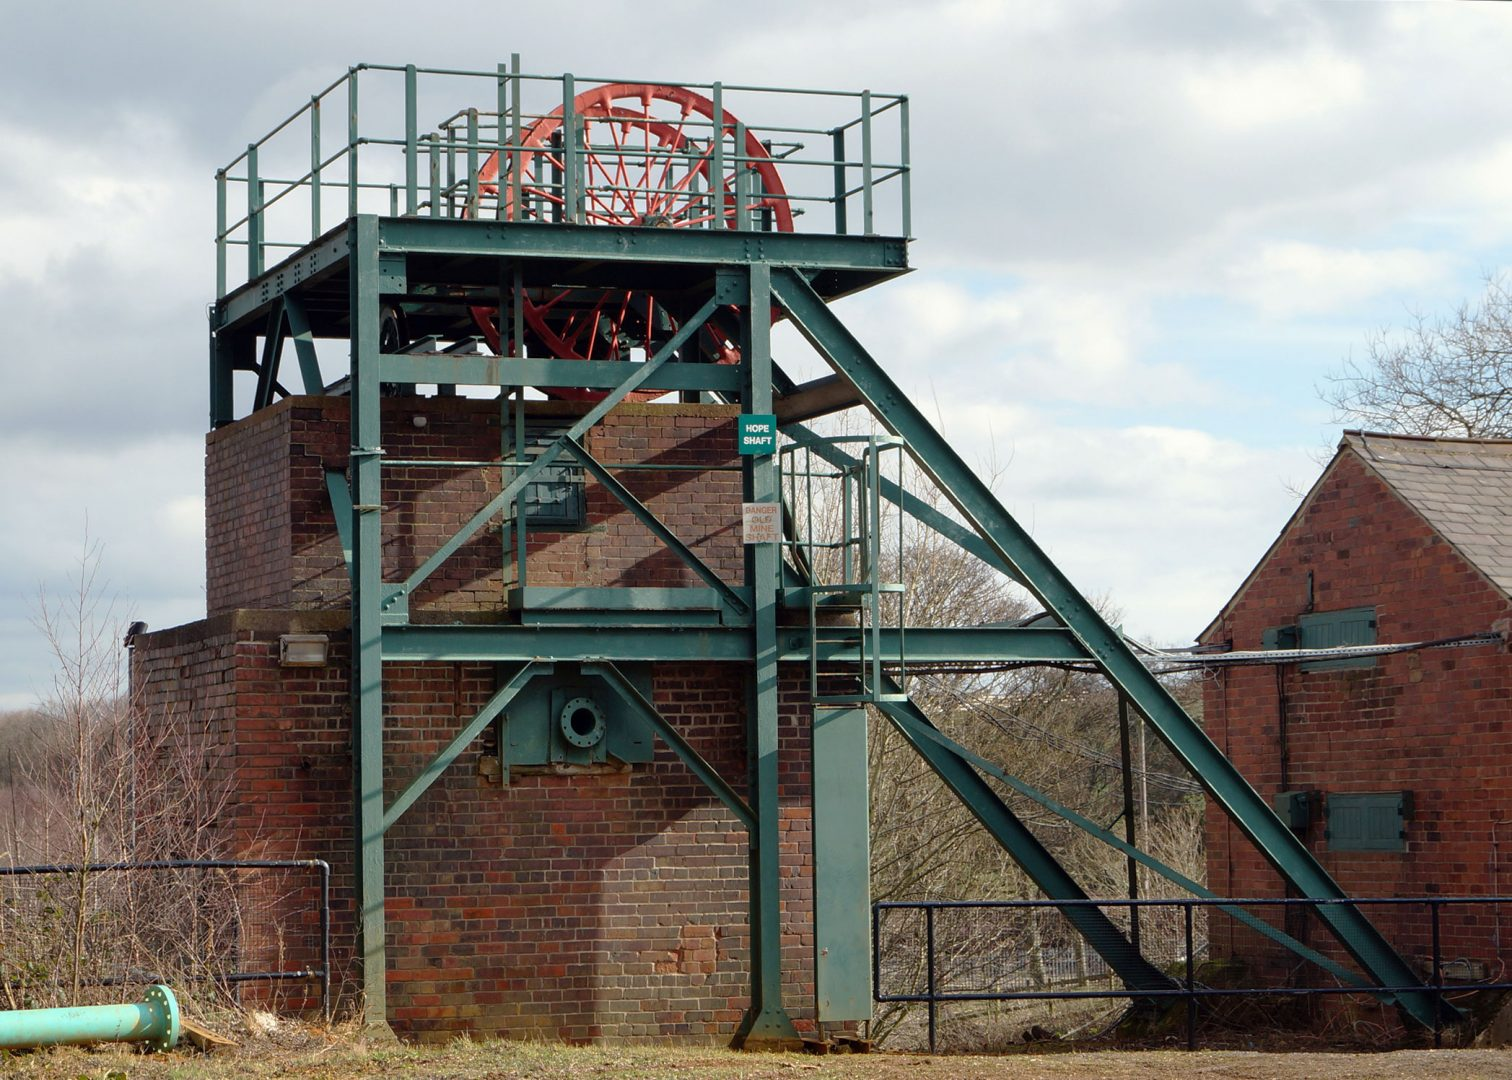 ecs borehole pump services   national coal mining museum ecs engineering services